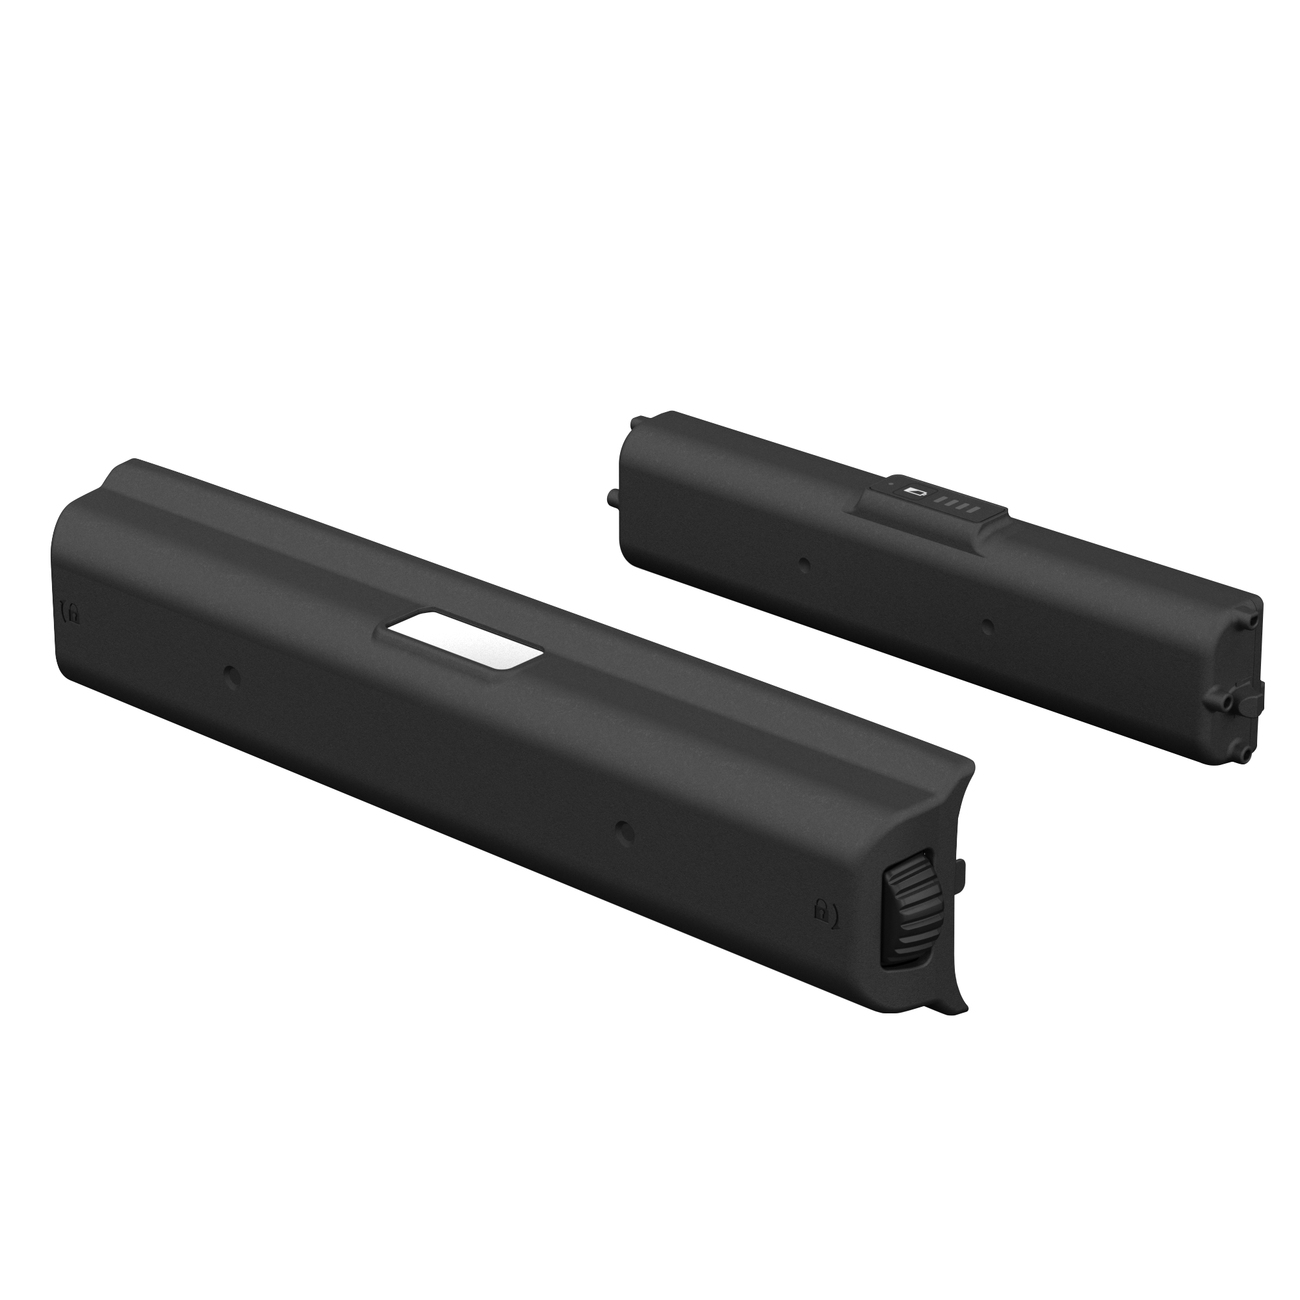 "Canon PIXMA TR150 - Tintenstrahl - 4800 x 1200 DPI - 8"" x 10"" (20x25 cm) - Randloser Druck - WLAN - Direkter Druck"